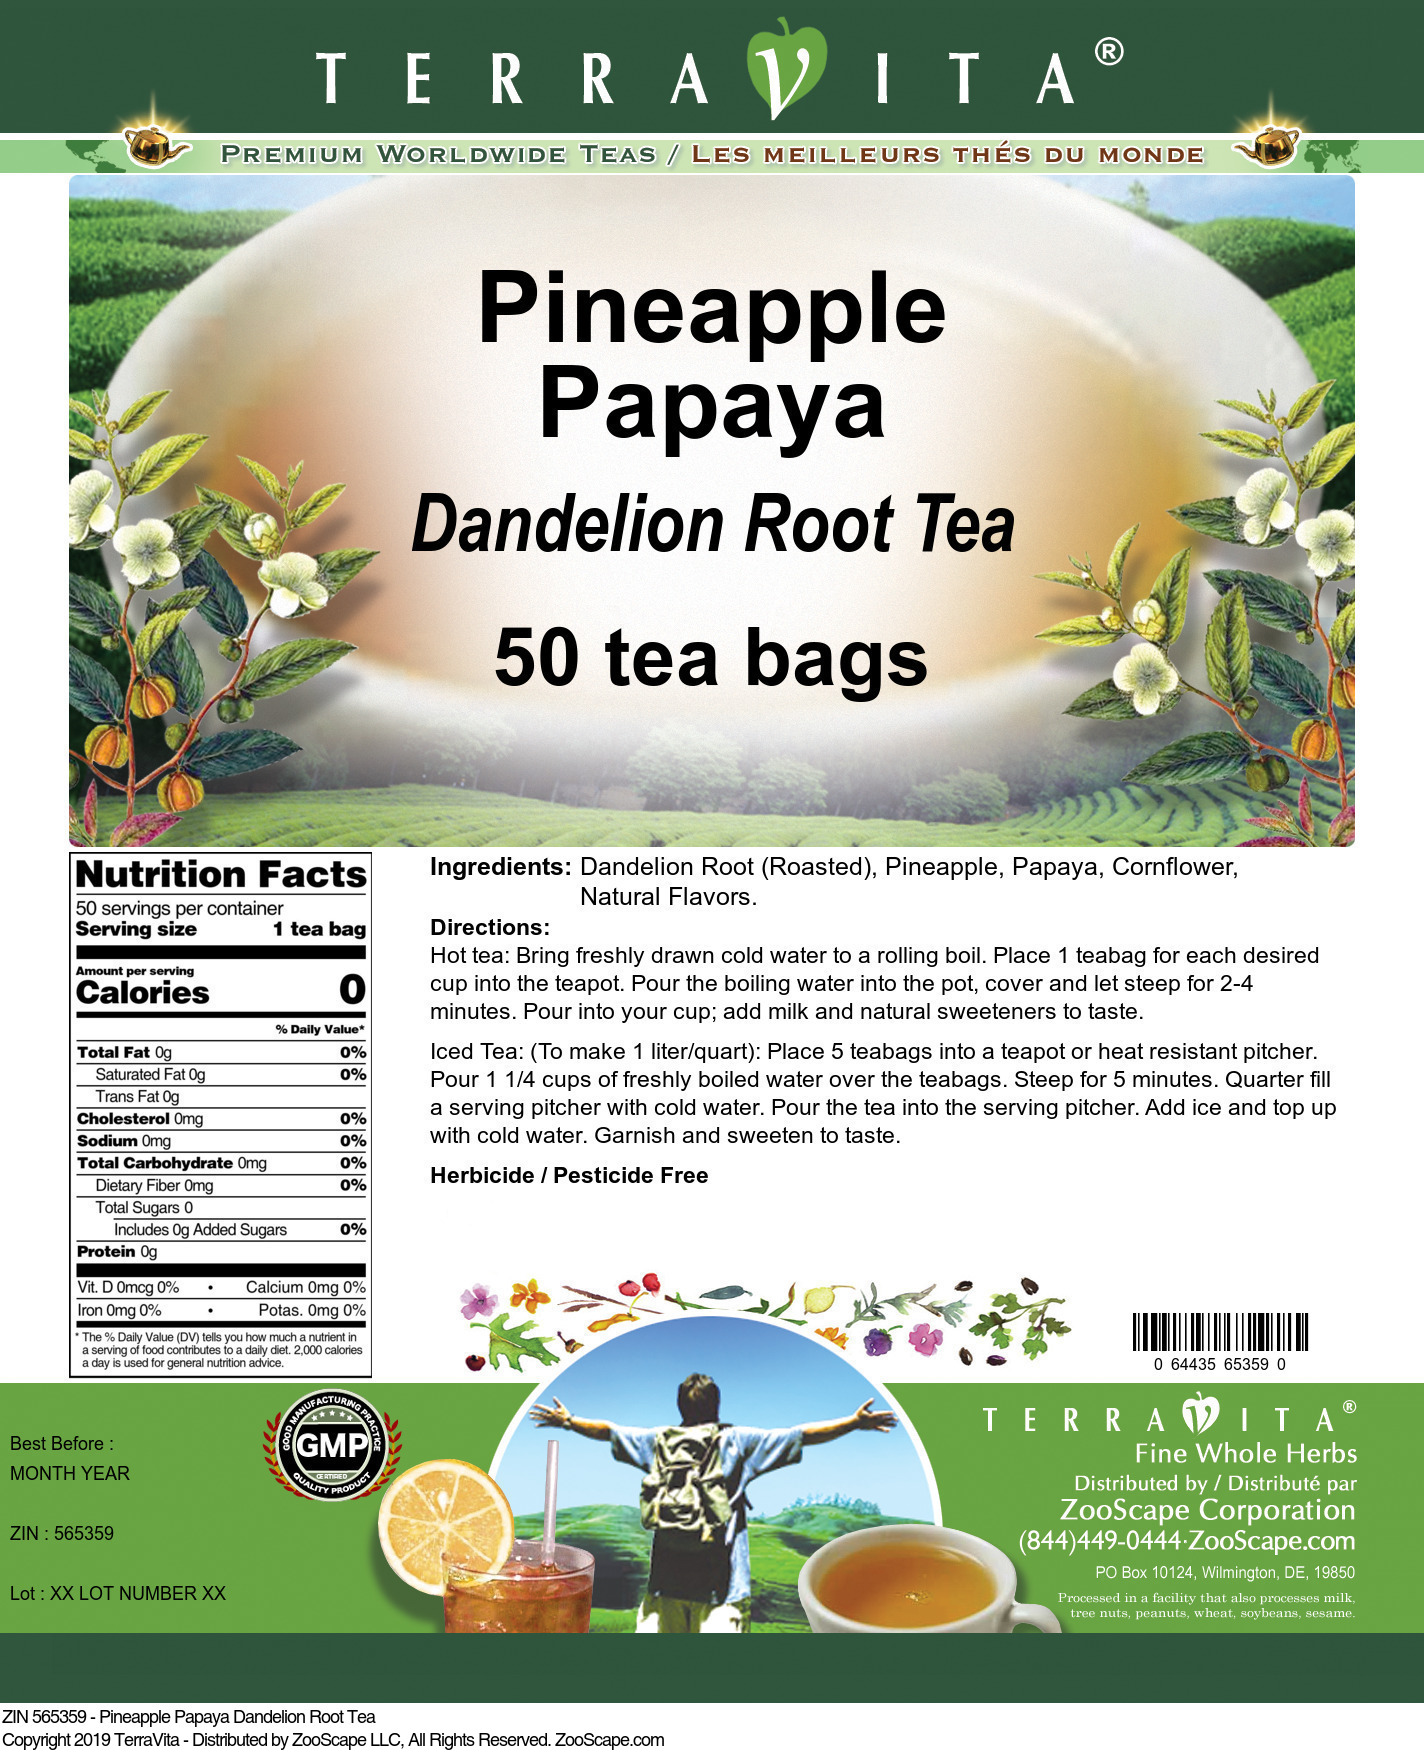 Pineapple Papaya Dandelion Root